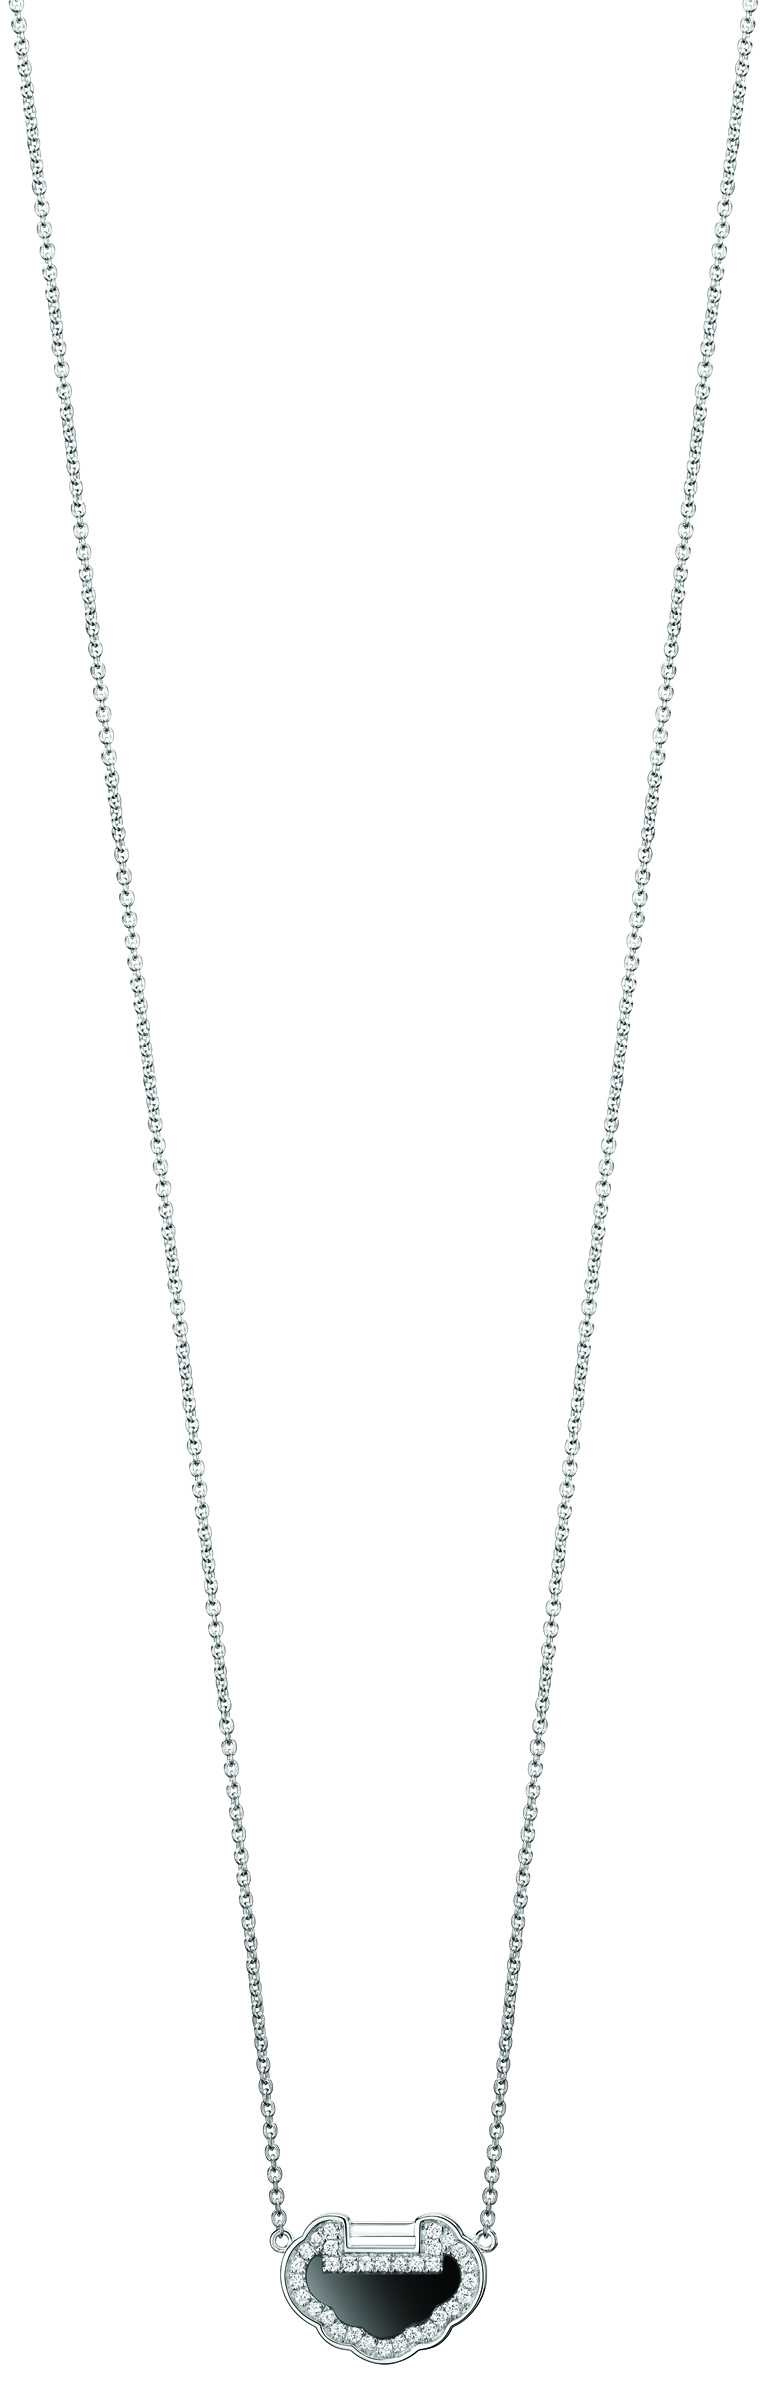 Qeelin「Petite Yu Yi系列」18K白金鑲鑽縞瑪瑙項鍊╱48,000元。(圖╱Qeelin提供)